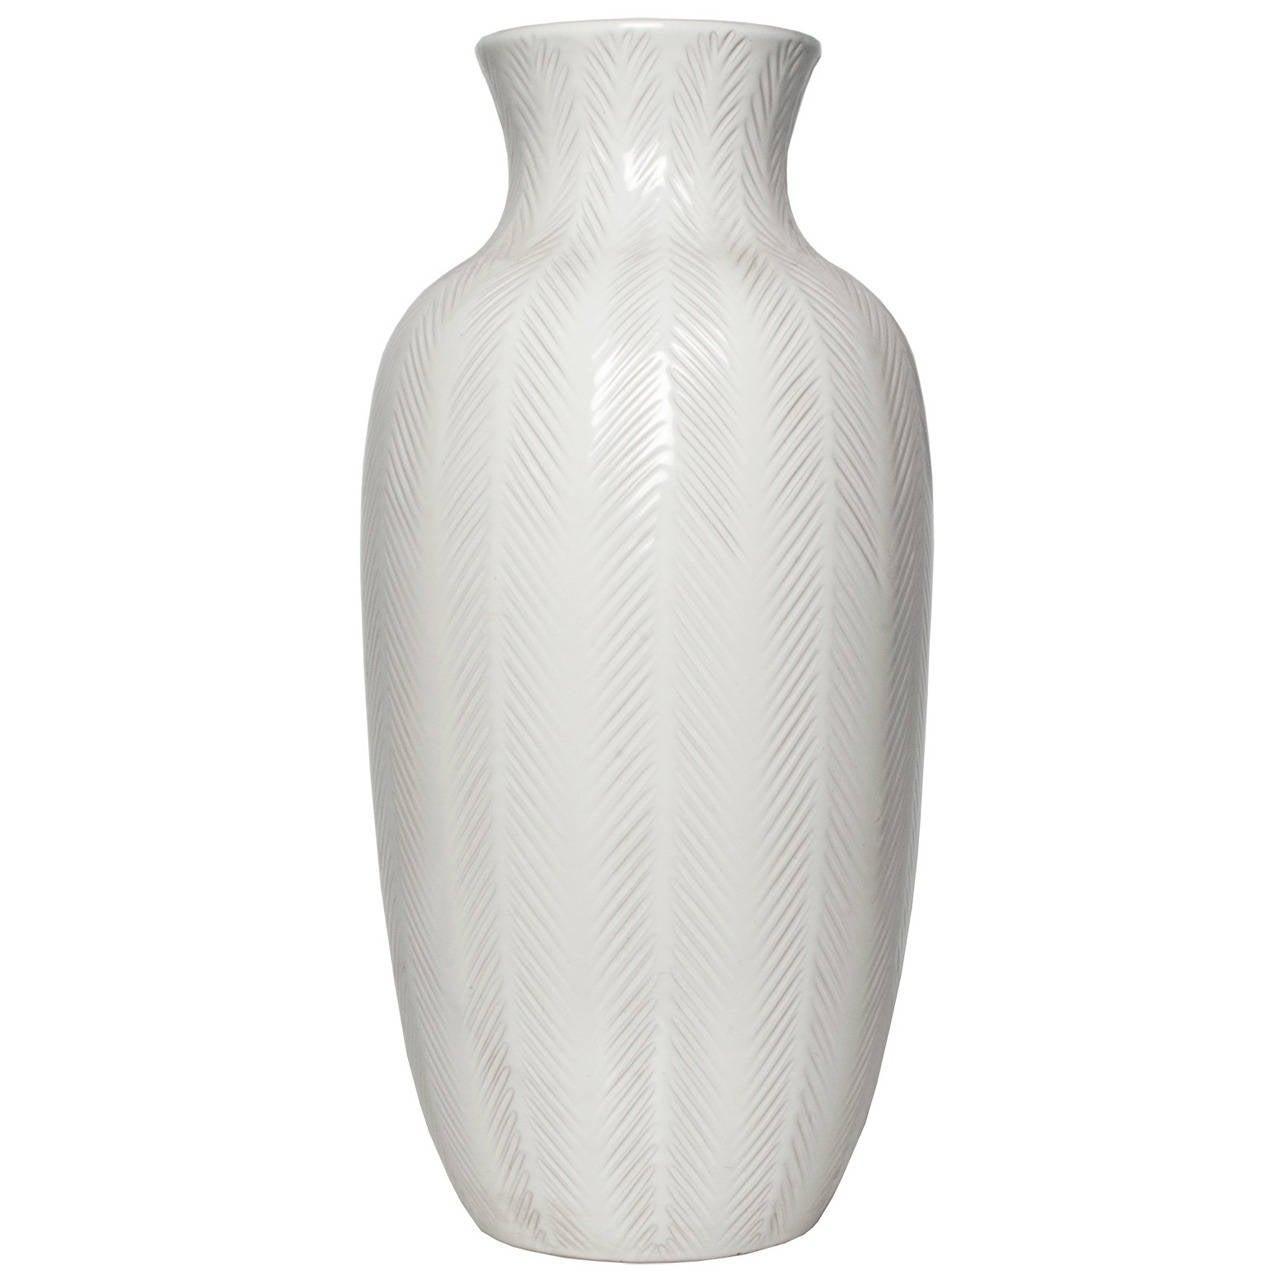 Large Swedish Art Deco, White Ceramic Vase by Anna-Lisa Thomson, circa 1930s